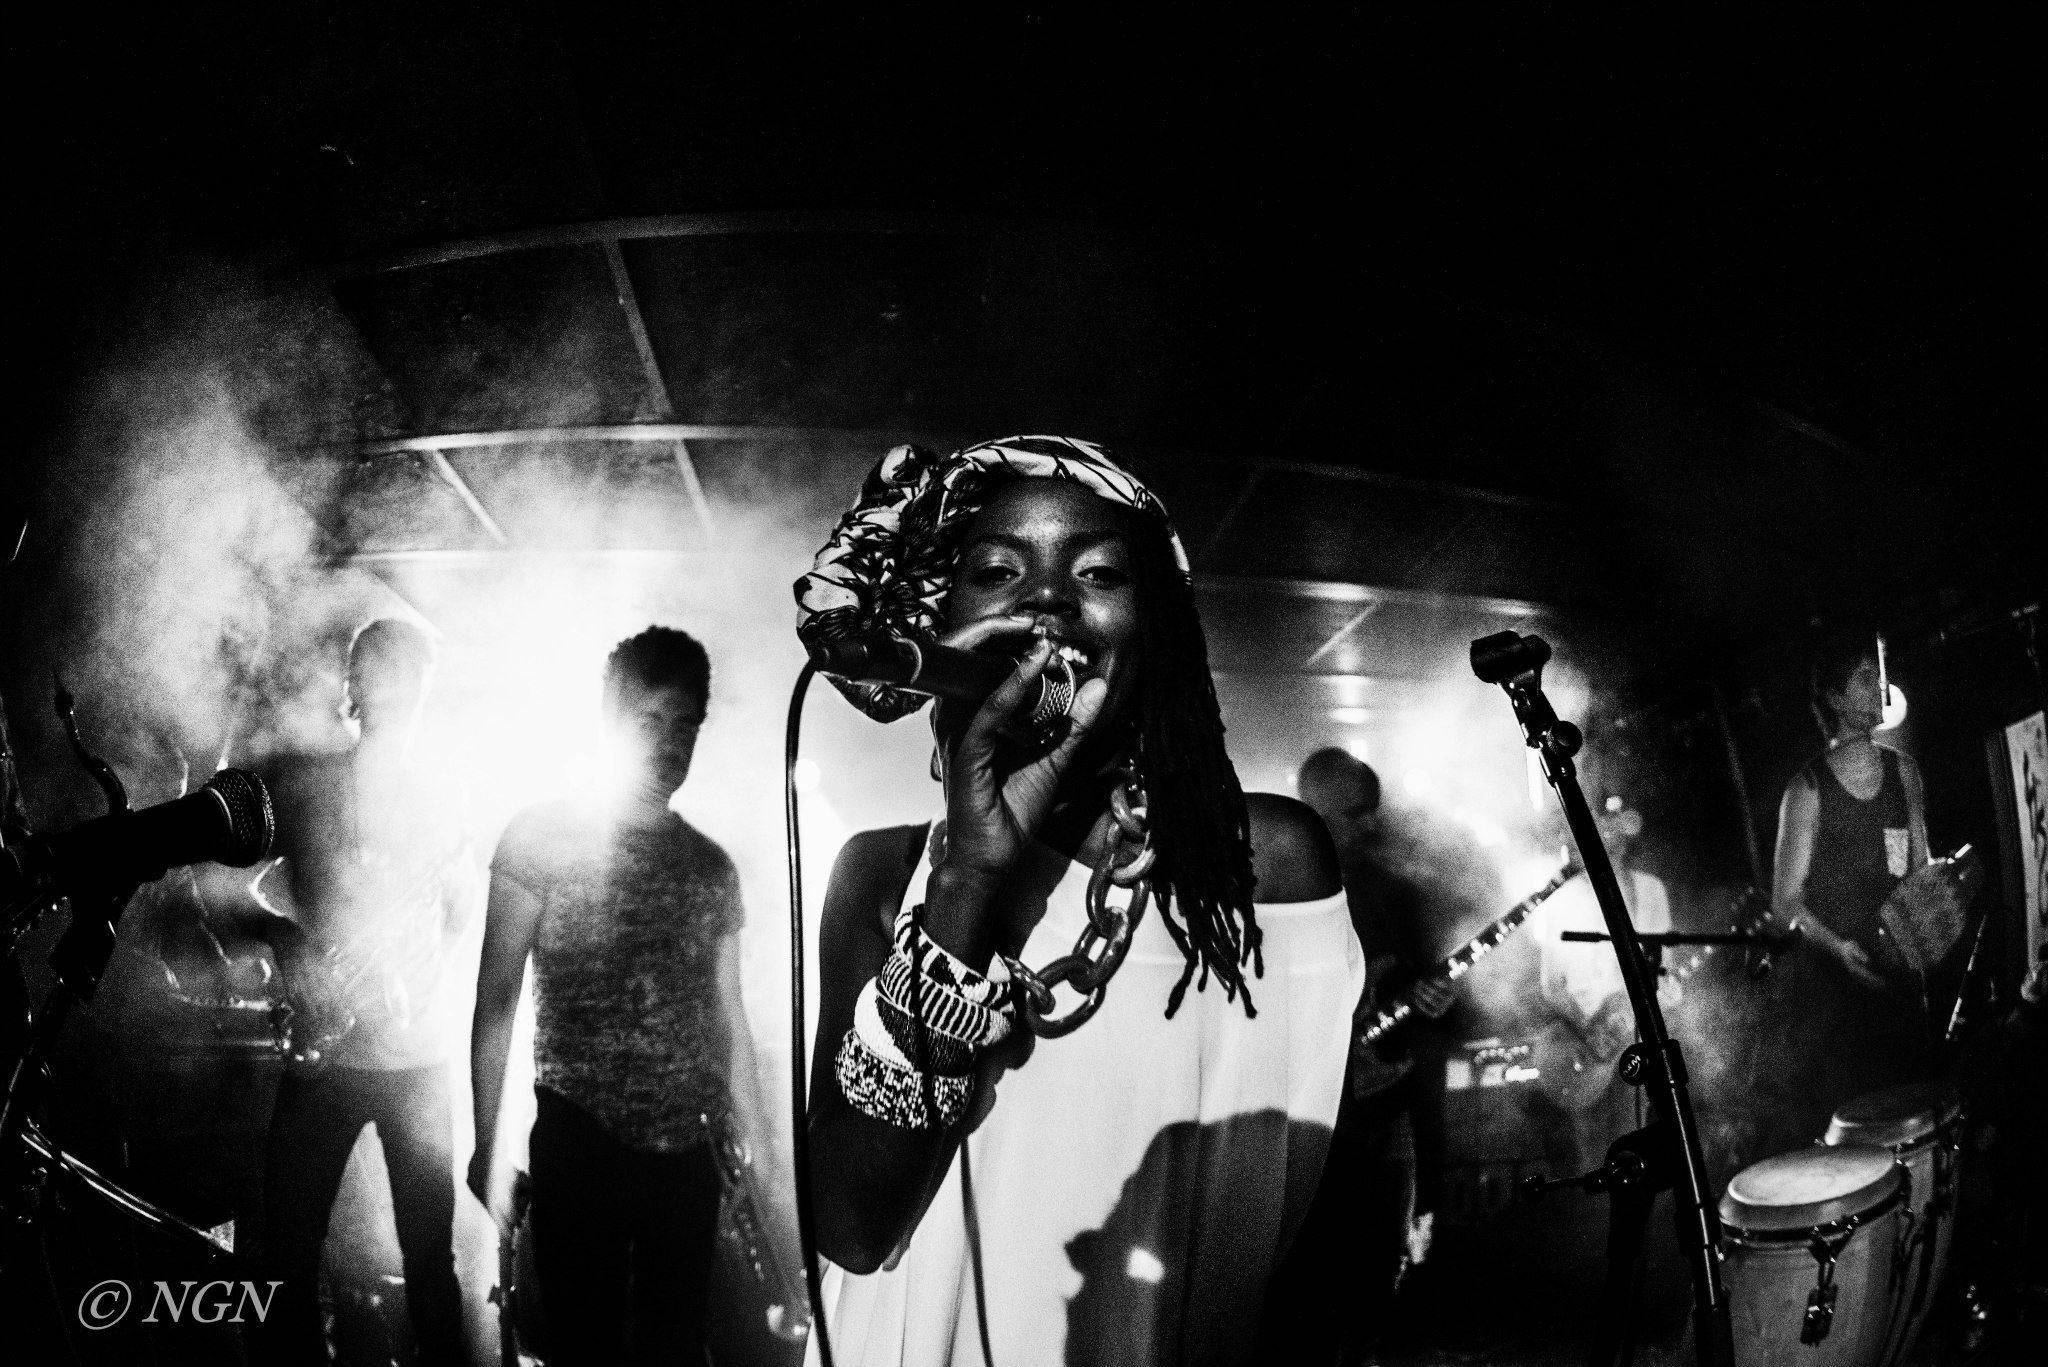 Grand Moff - Pharfar - Tina Mweni